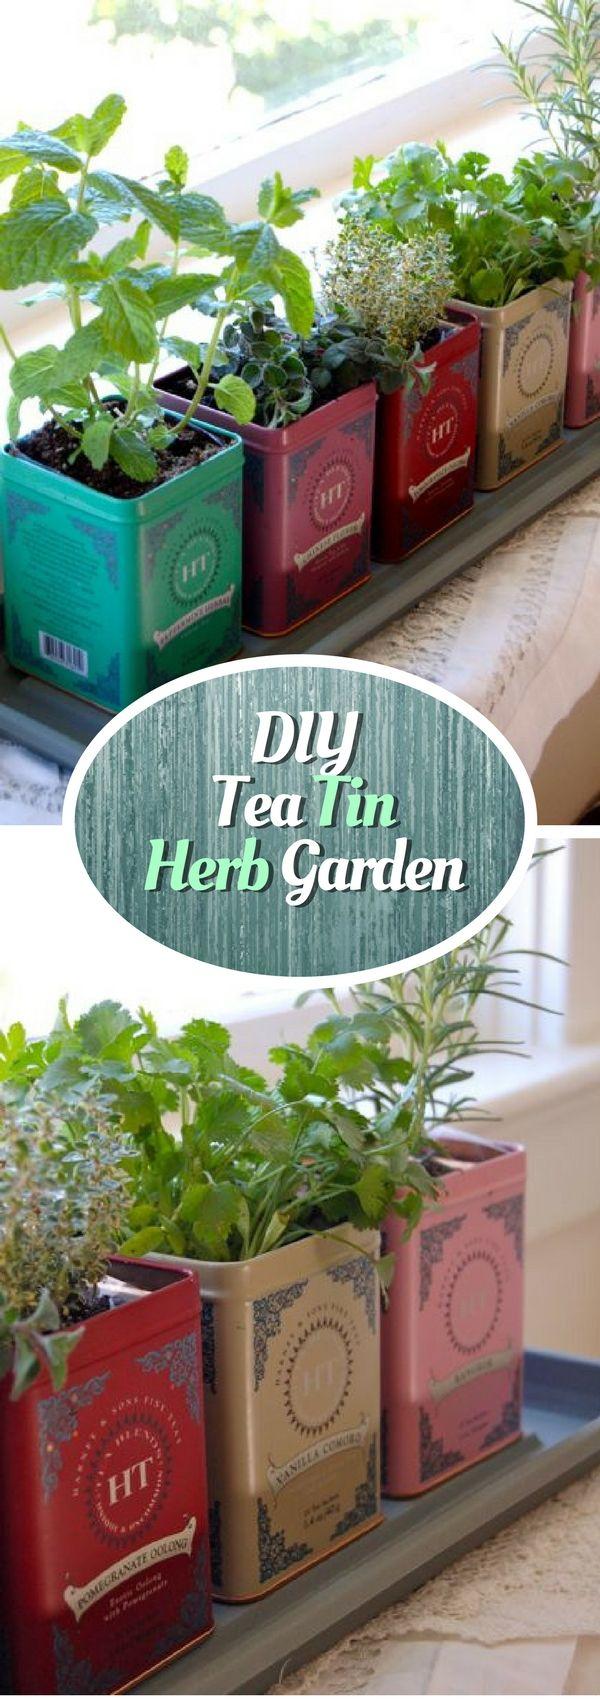 Check out how to make a DIY herb garden form tea tin cans @istandarddesign